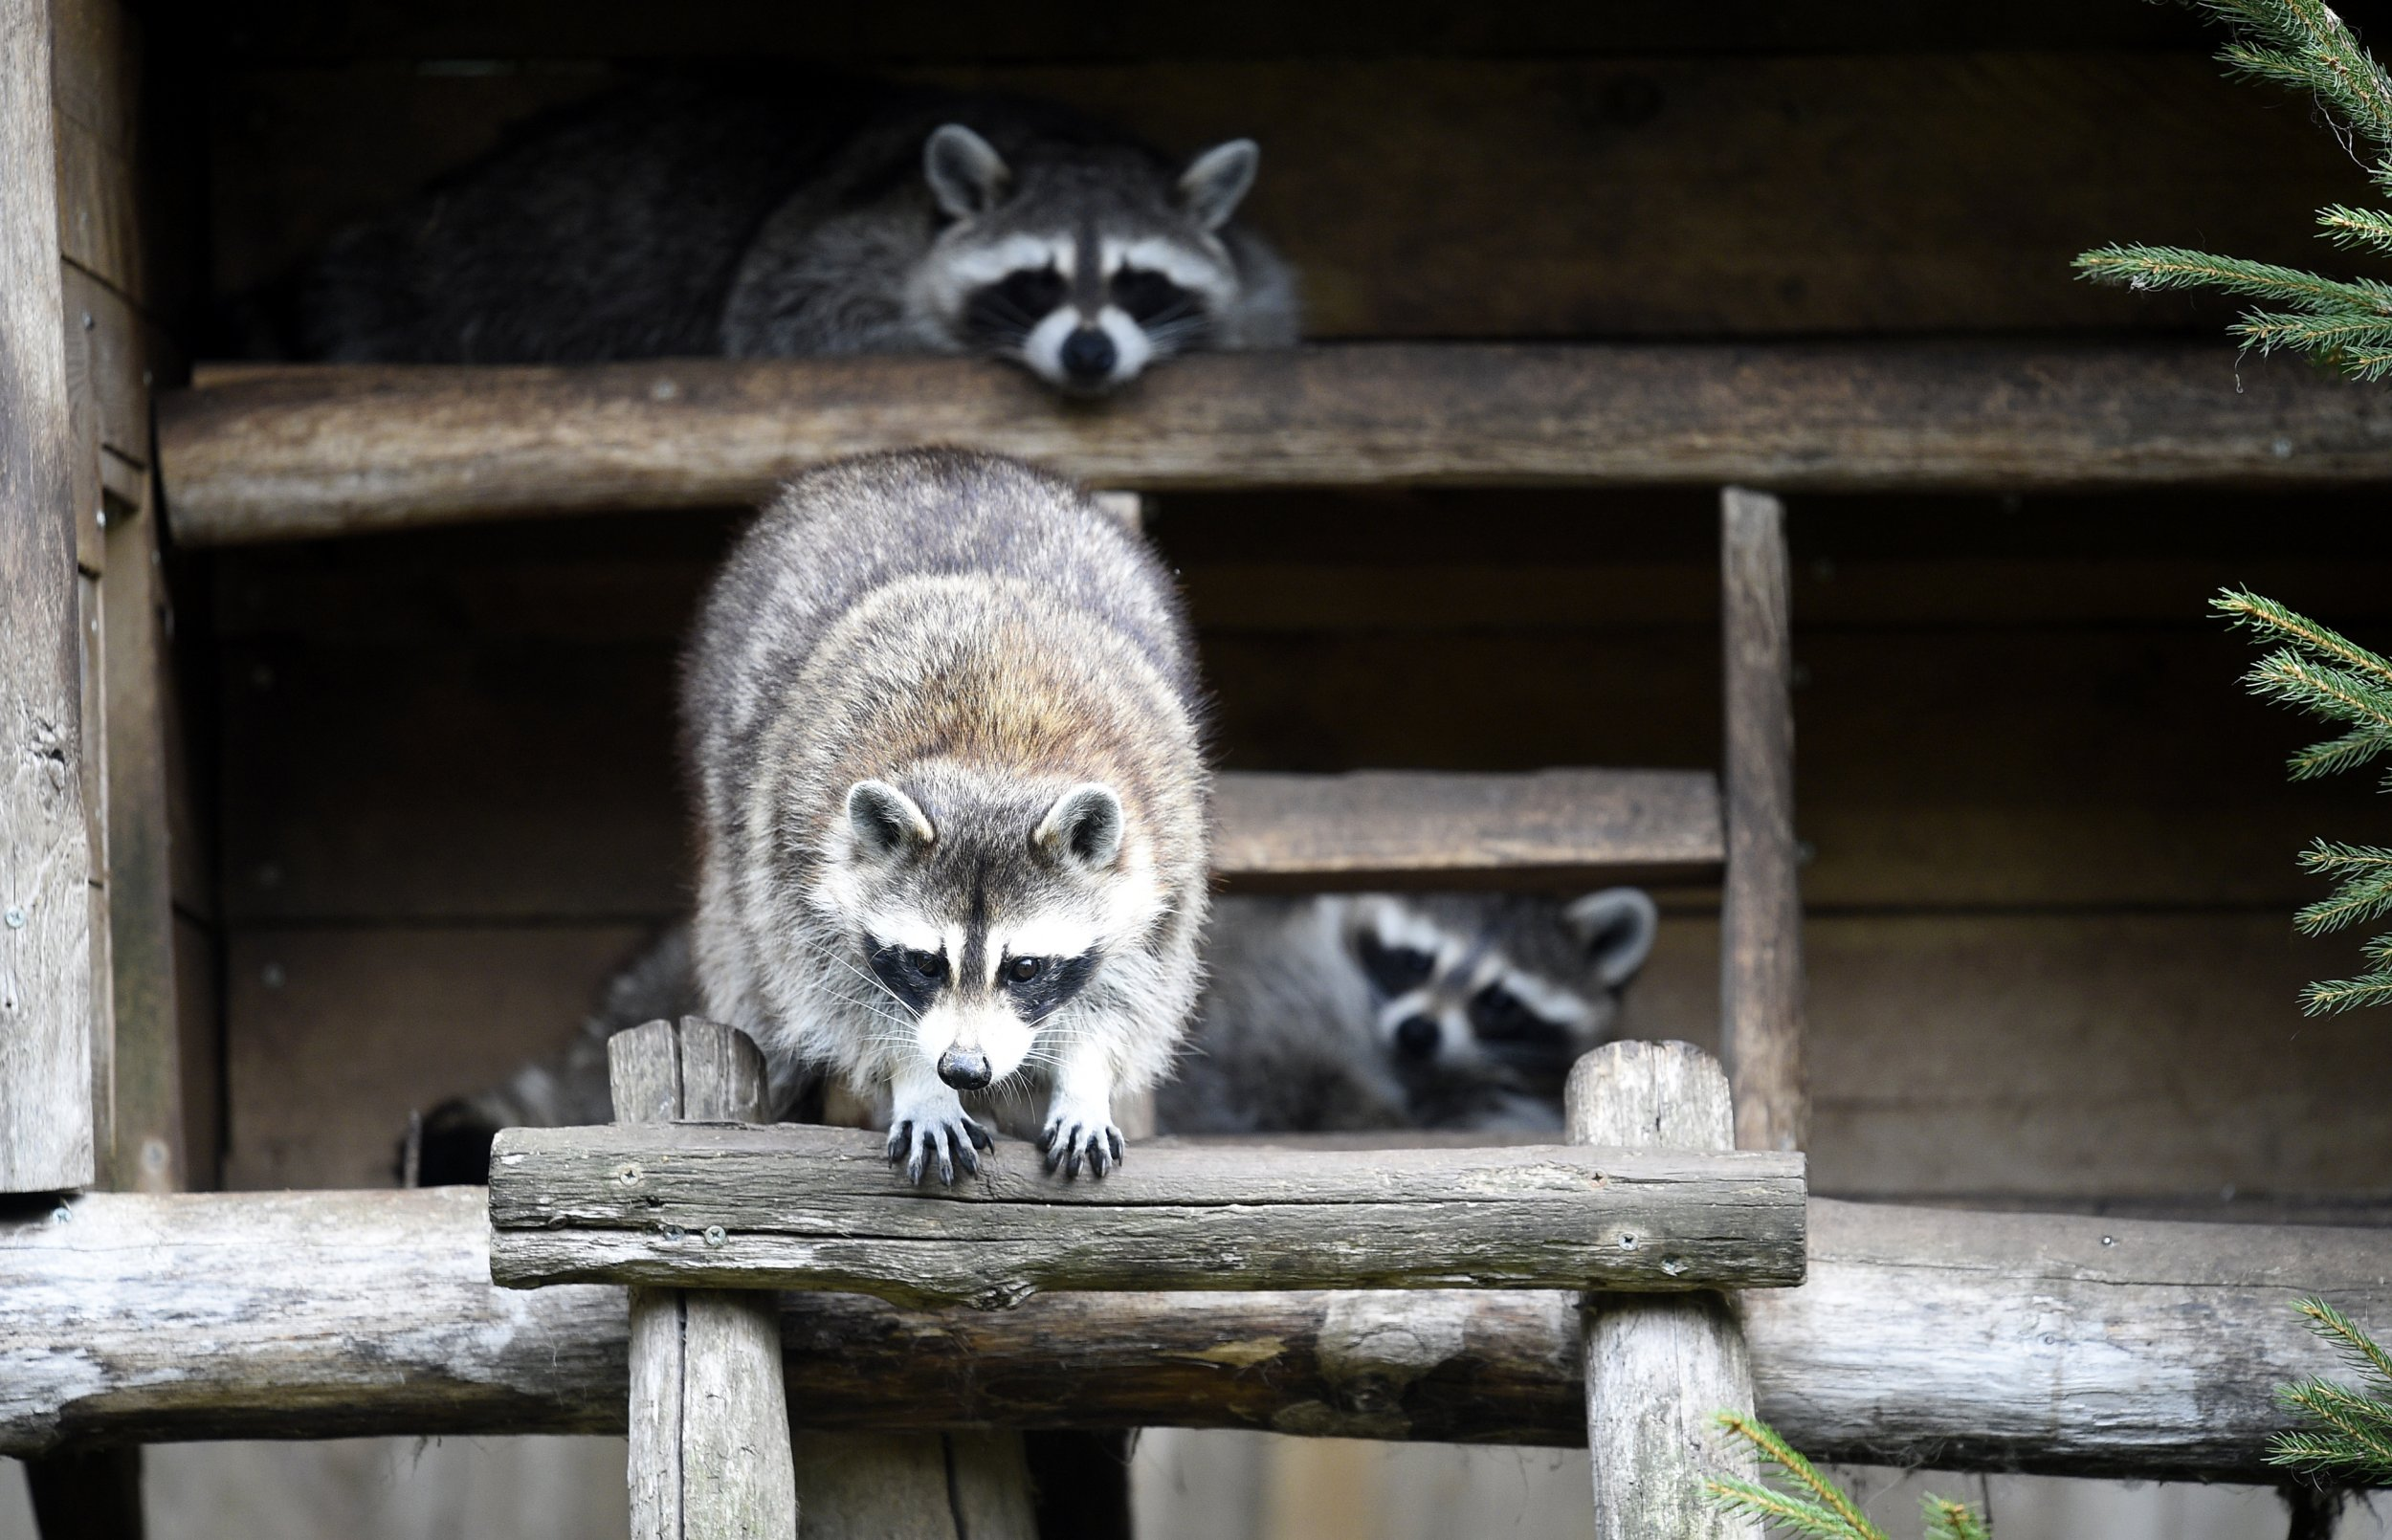 12_26_Raccoons